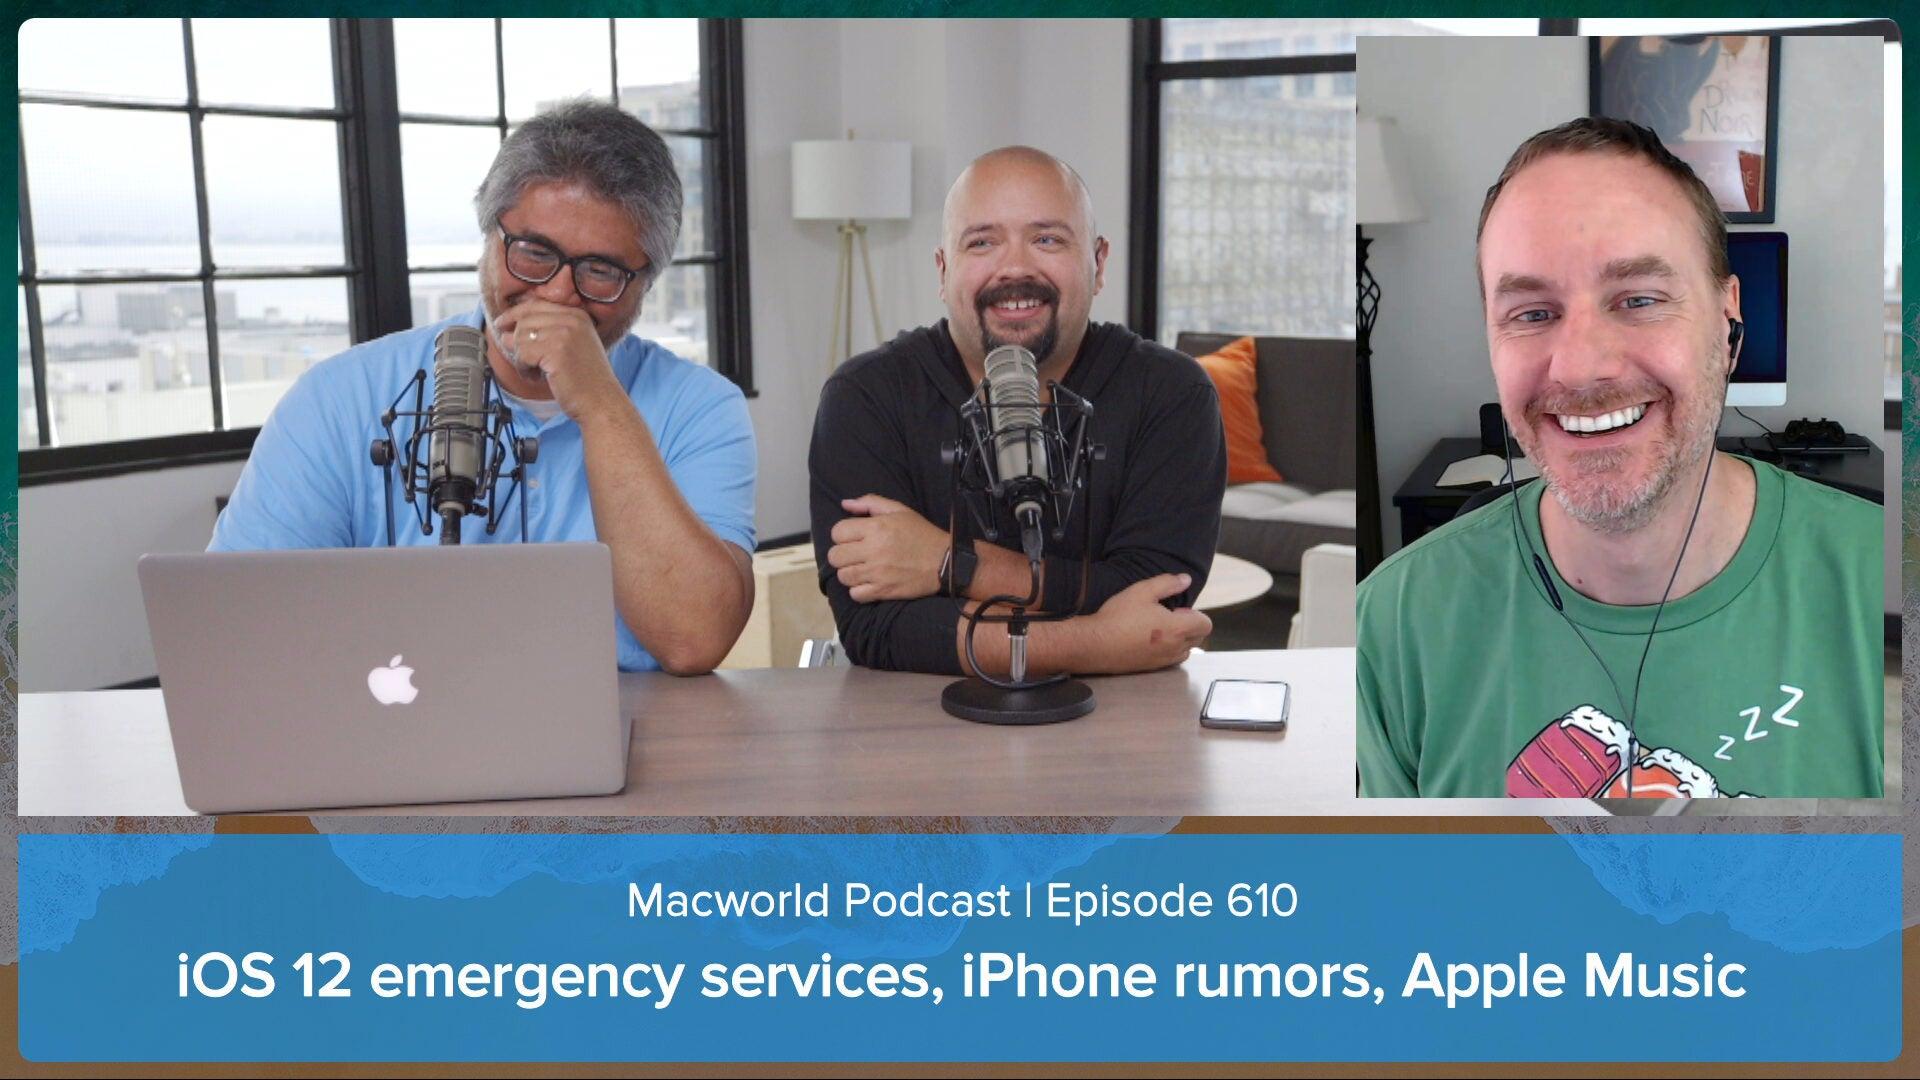 Macworld Podcast 610